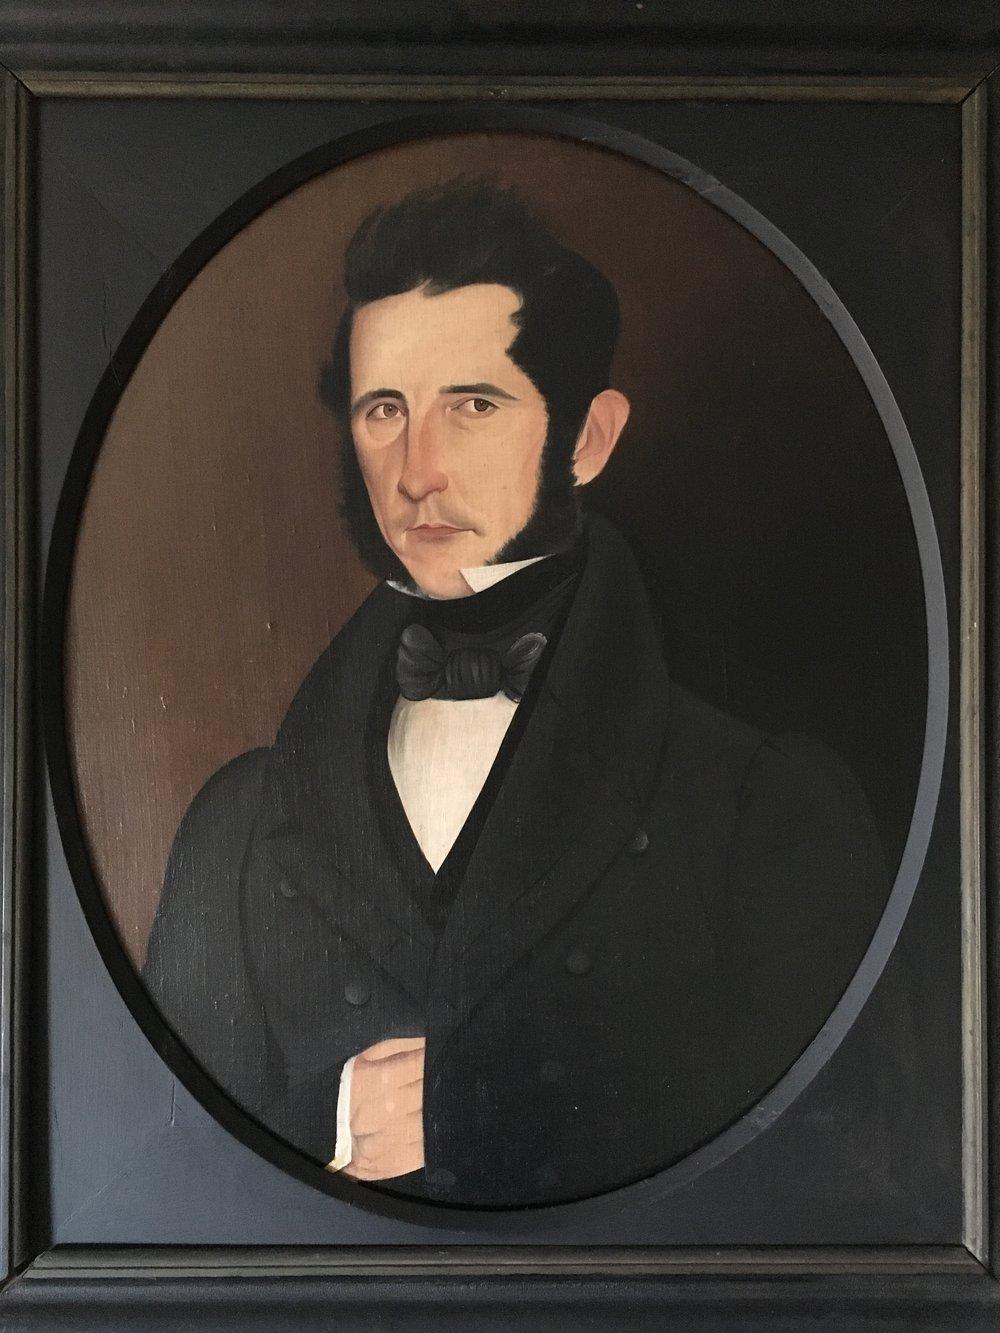 Peck lhs original painting 1.JPG